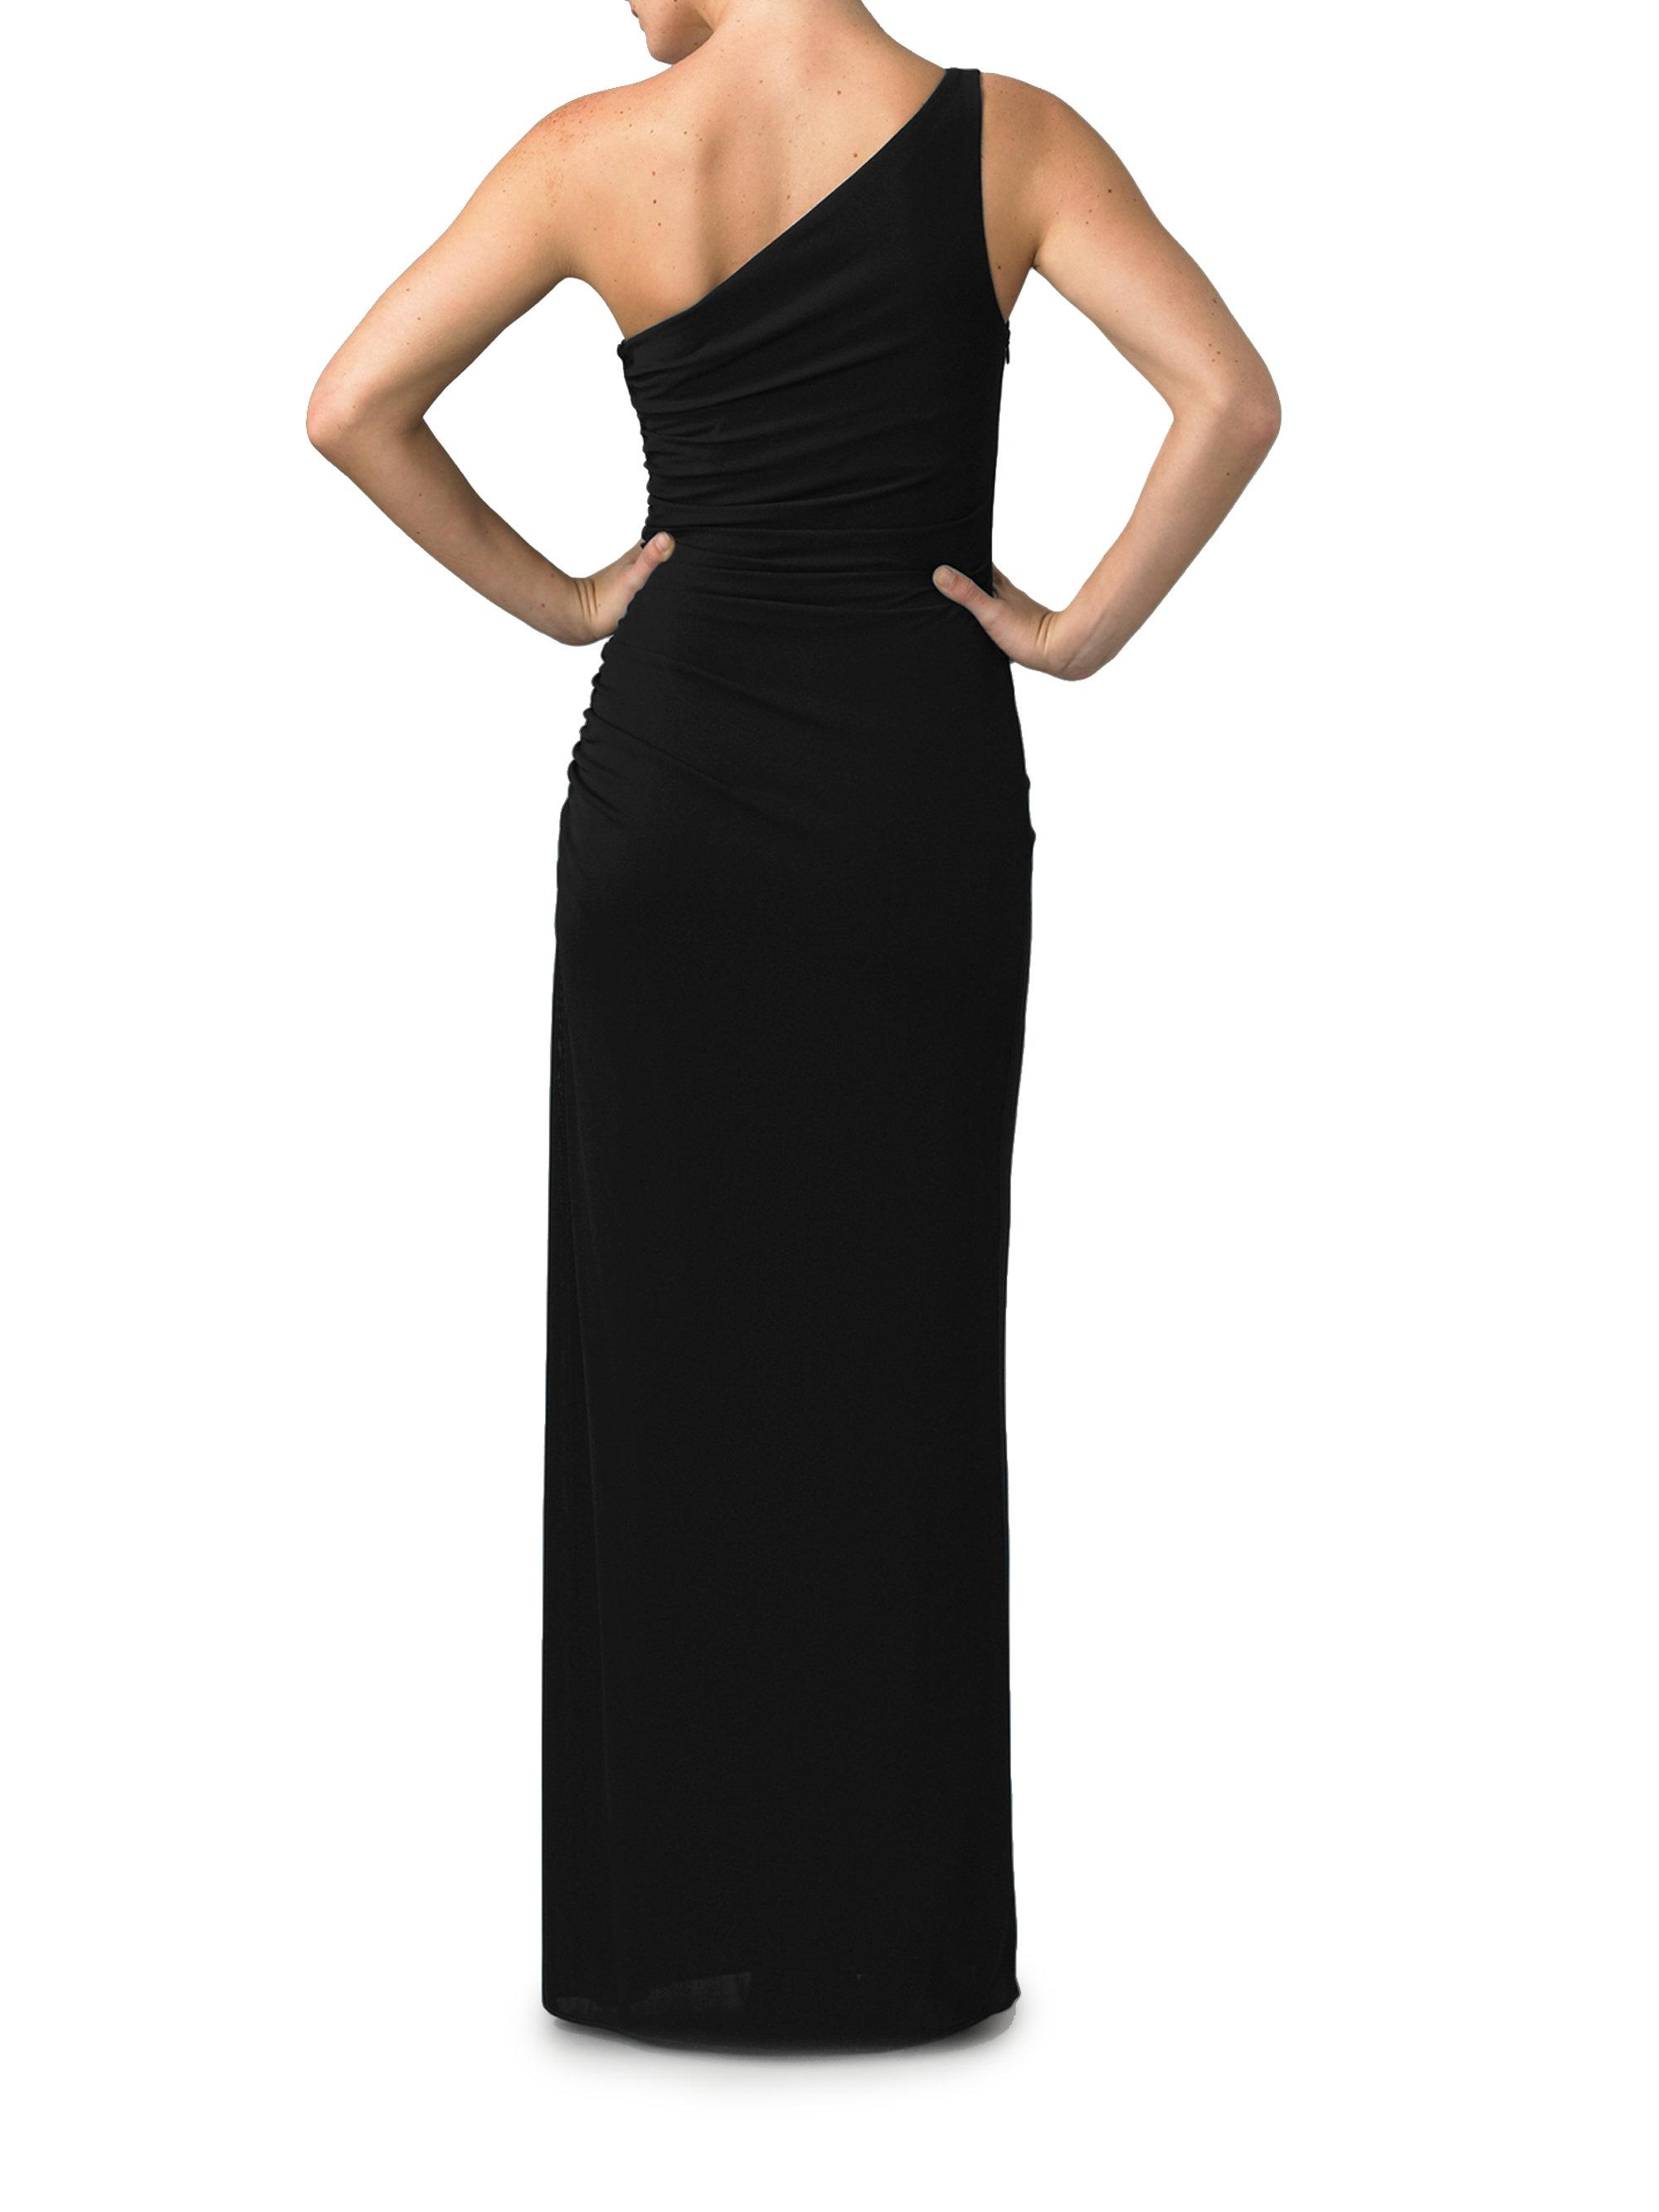 bb3d441fedf Laundry by Shelli Segal One-shoulder Matte Jersey Dress in Black - Lyst